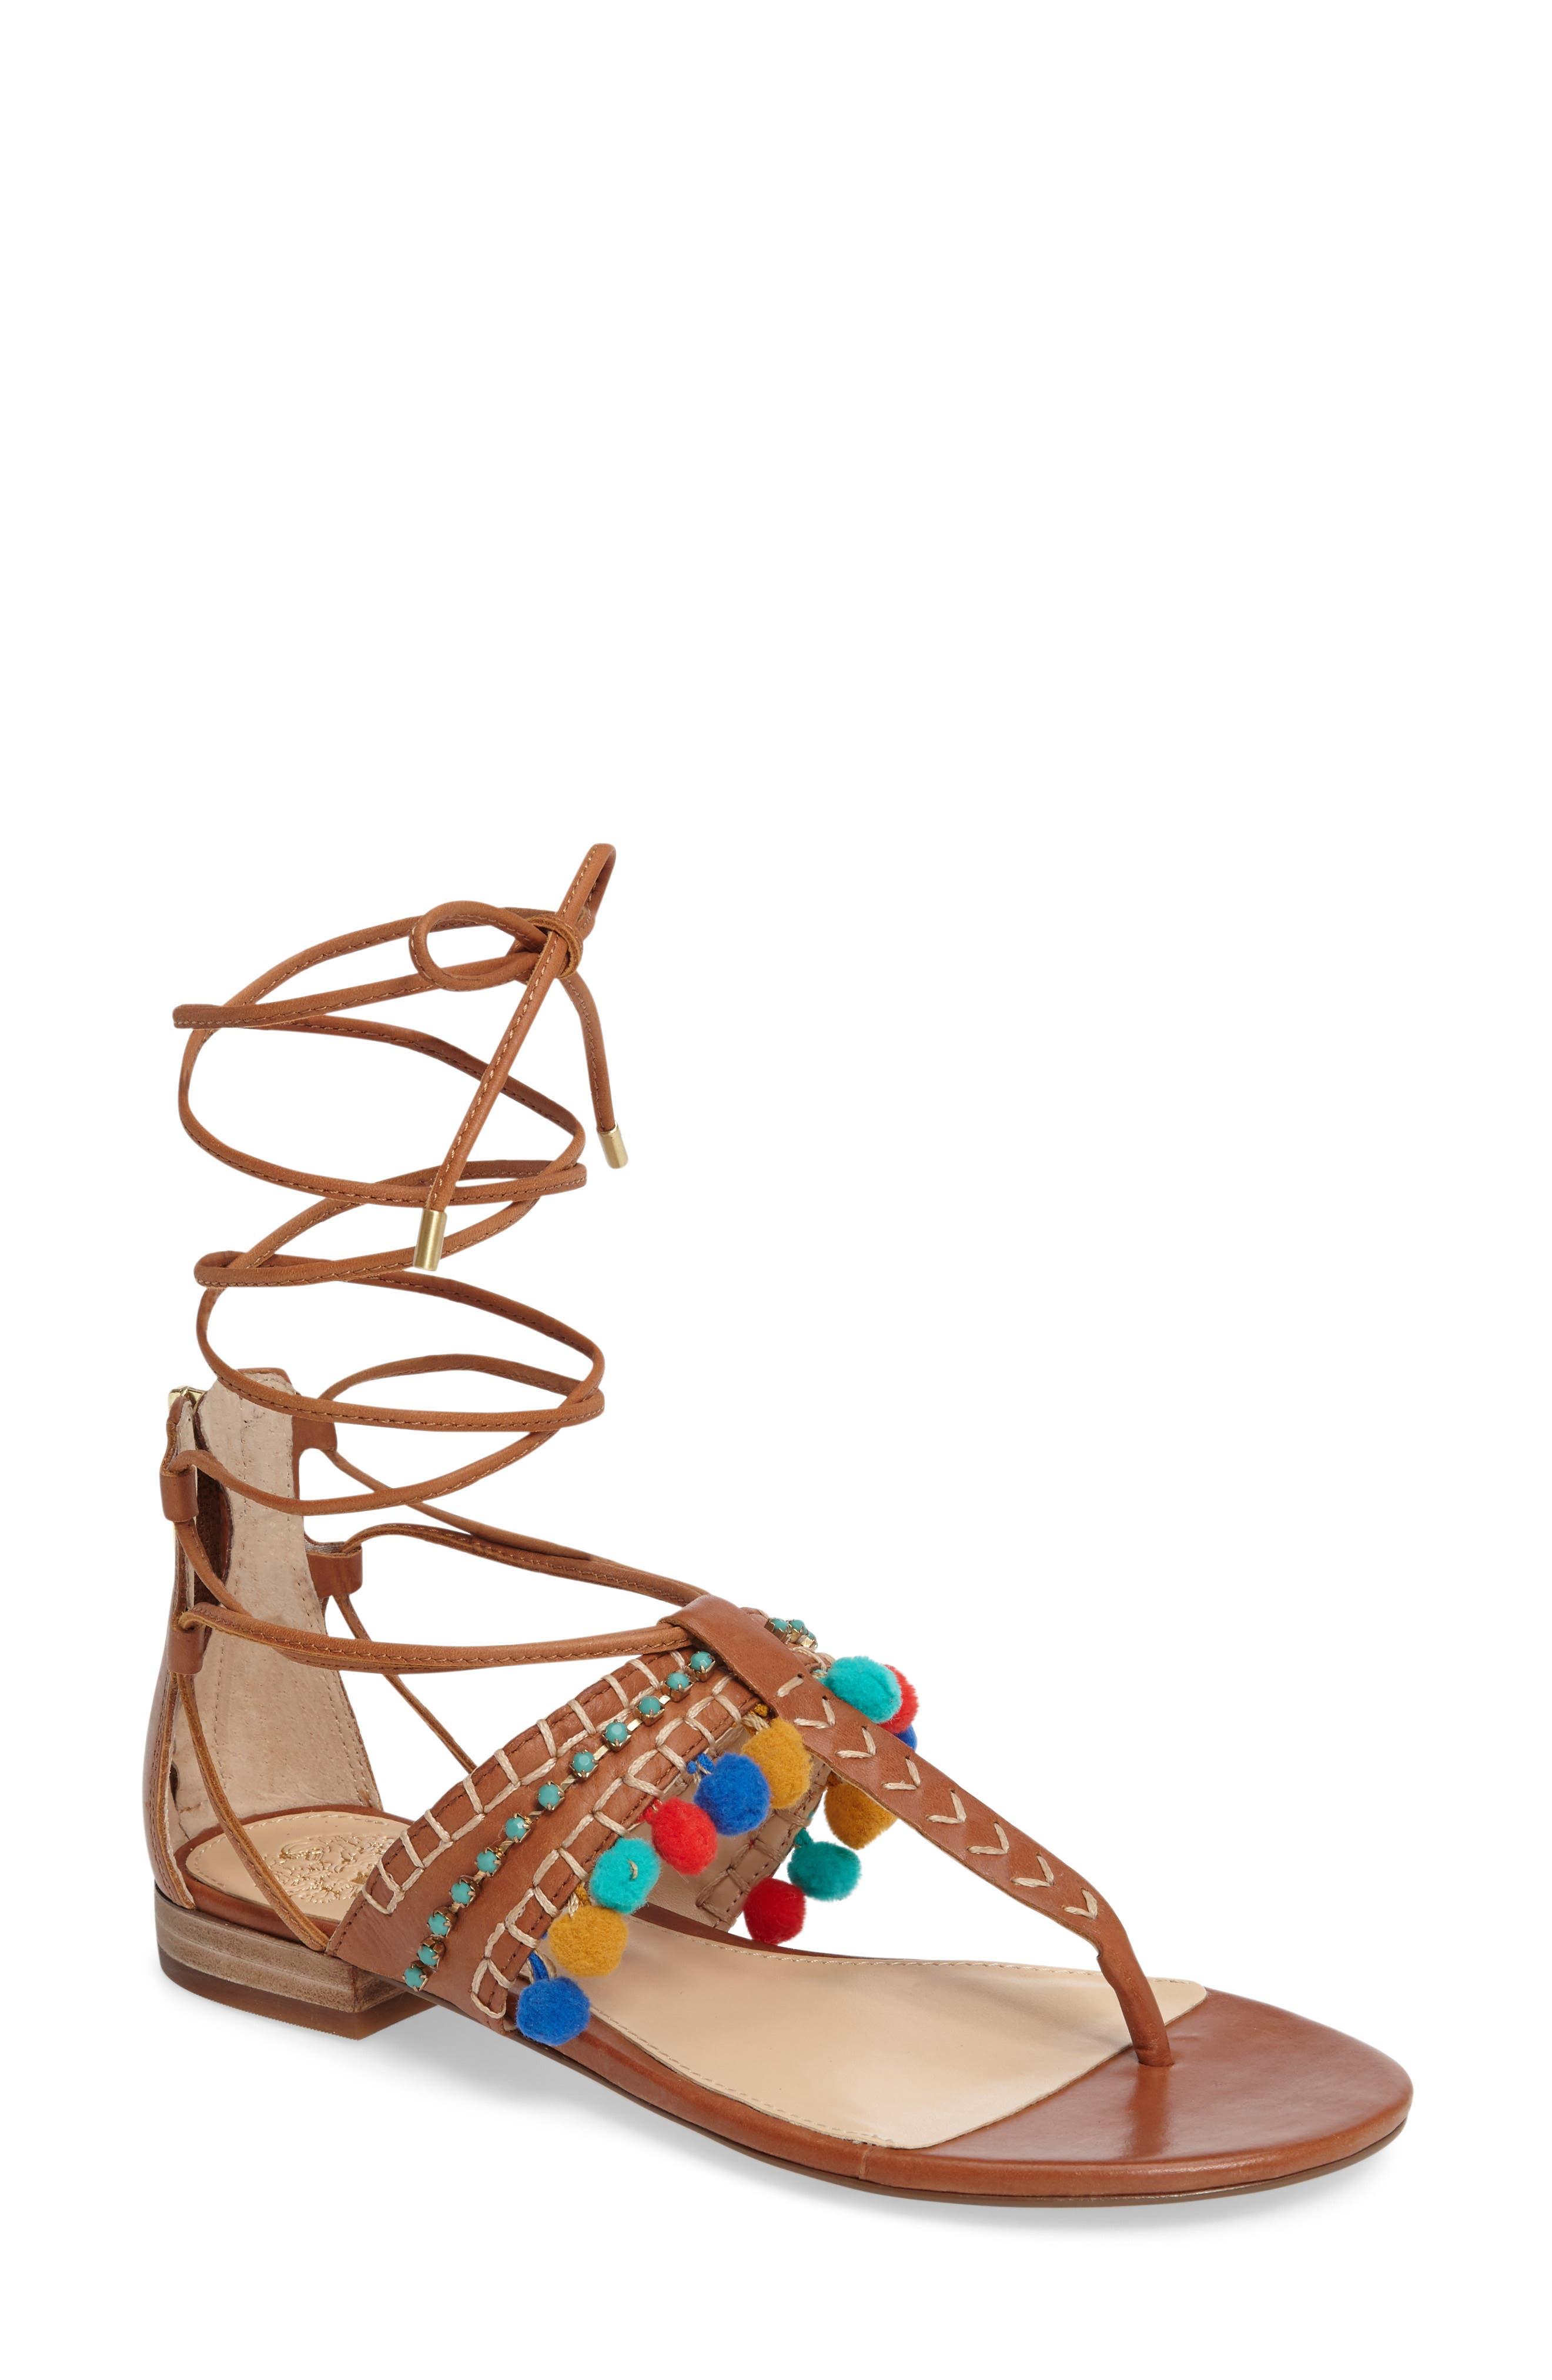 Alternate Image 1 Selected - Vince Camuto Balisa Embellished Lace-Up Sandal (Women)